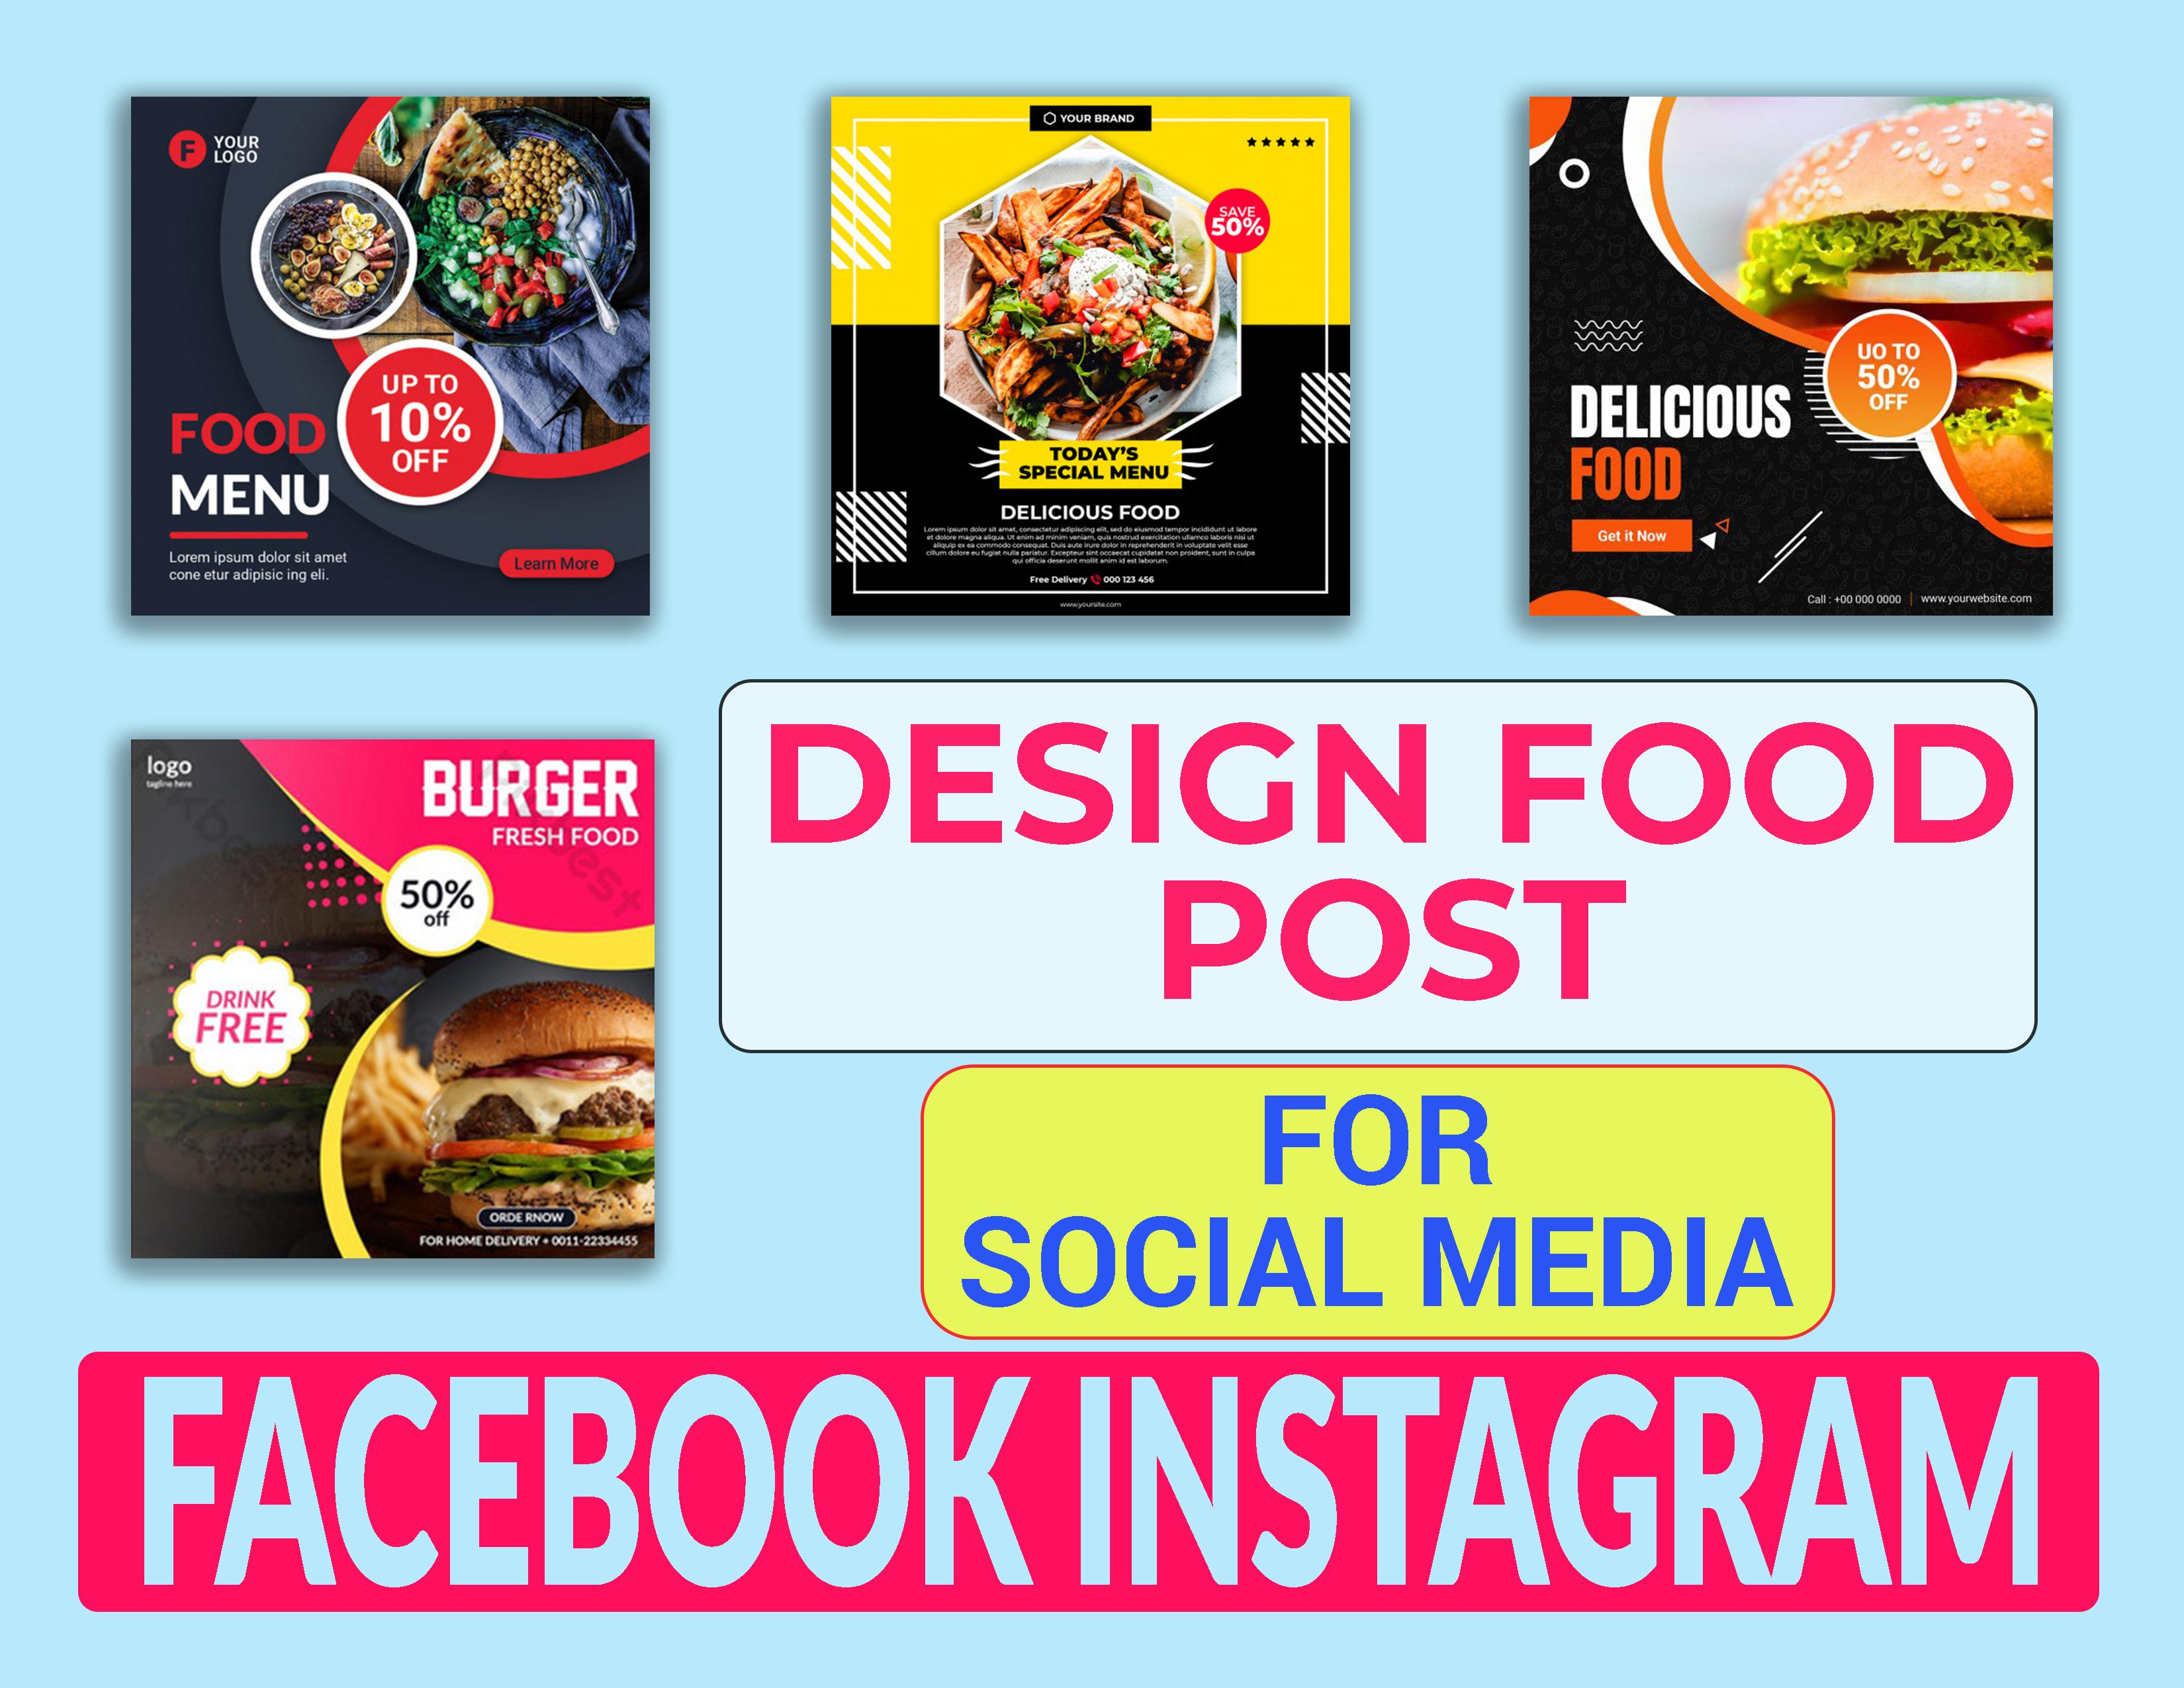 I will design food promo post for social media as Facebook Instagram